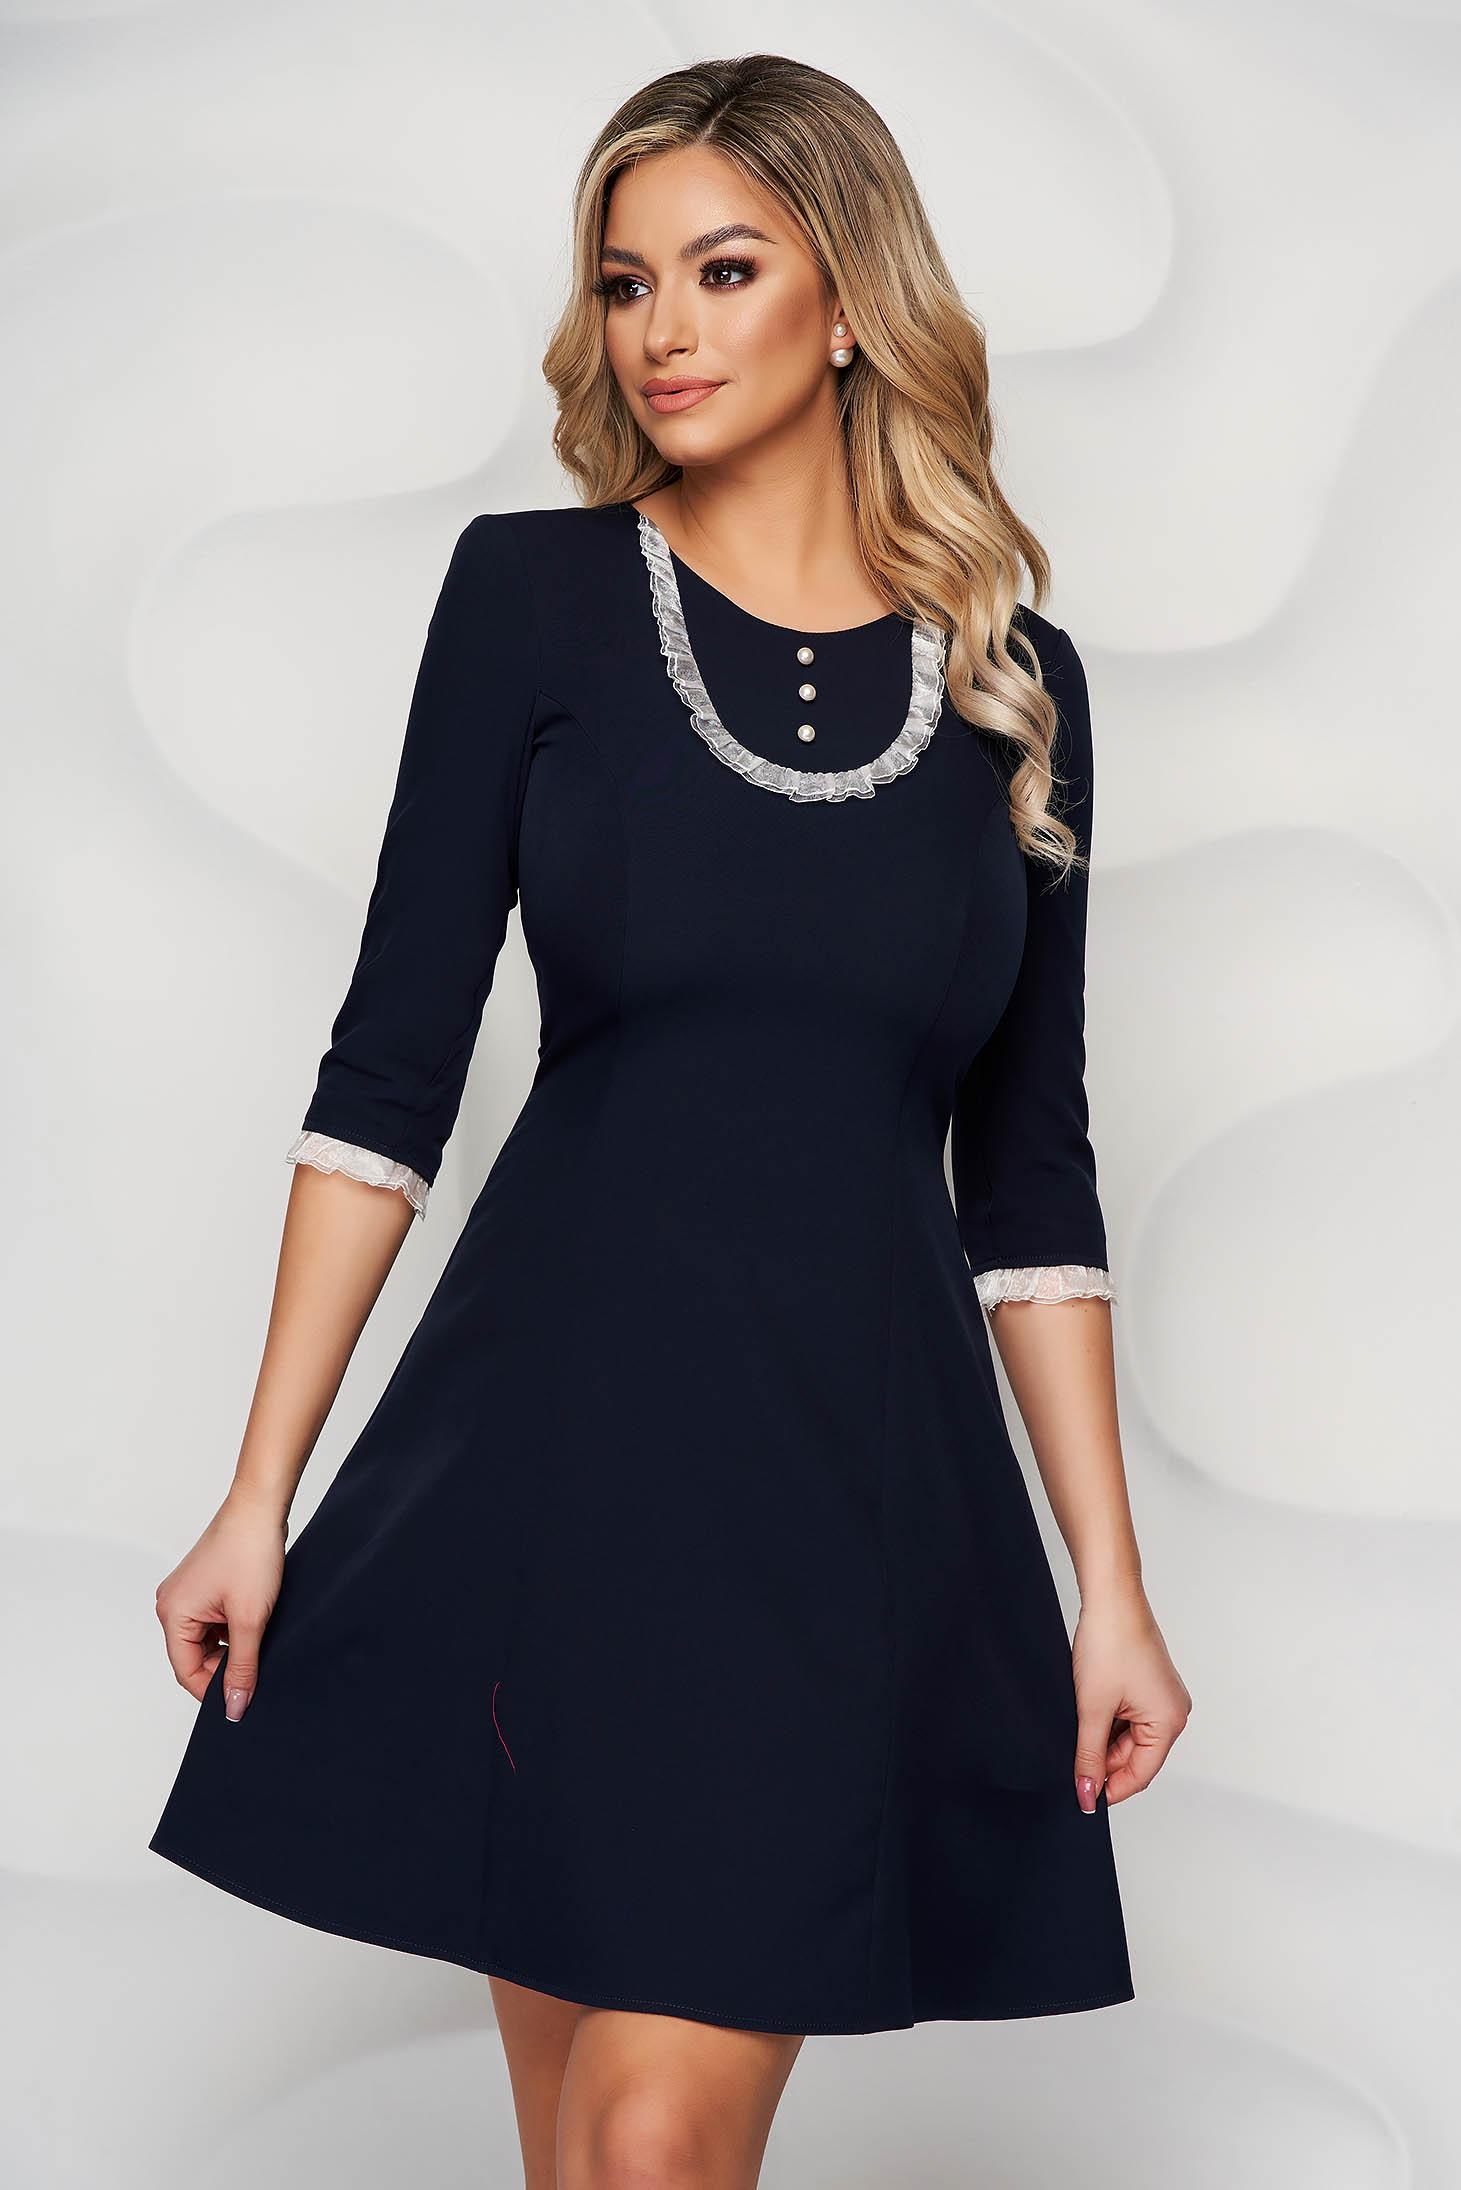 Rochie StarShinerS albastru-inchis eleganta scurta cu aplicatii de dantela din stofa